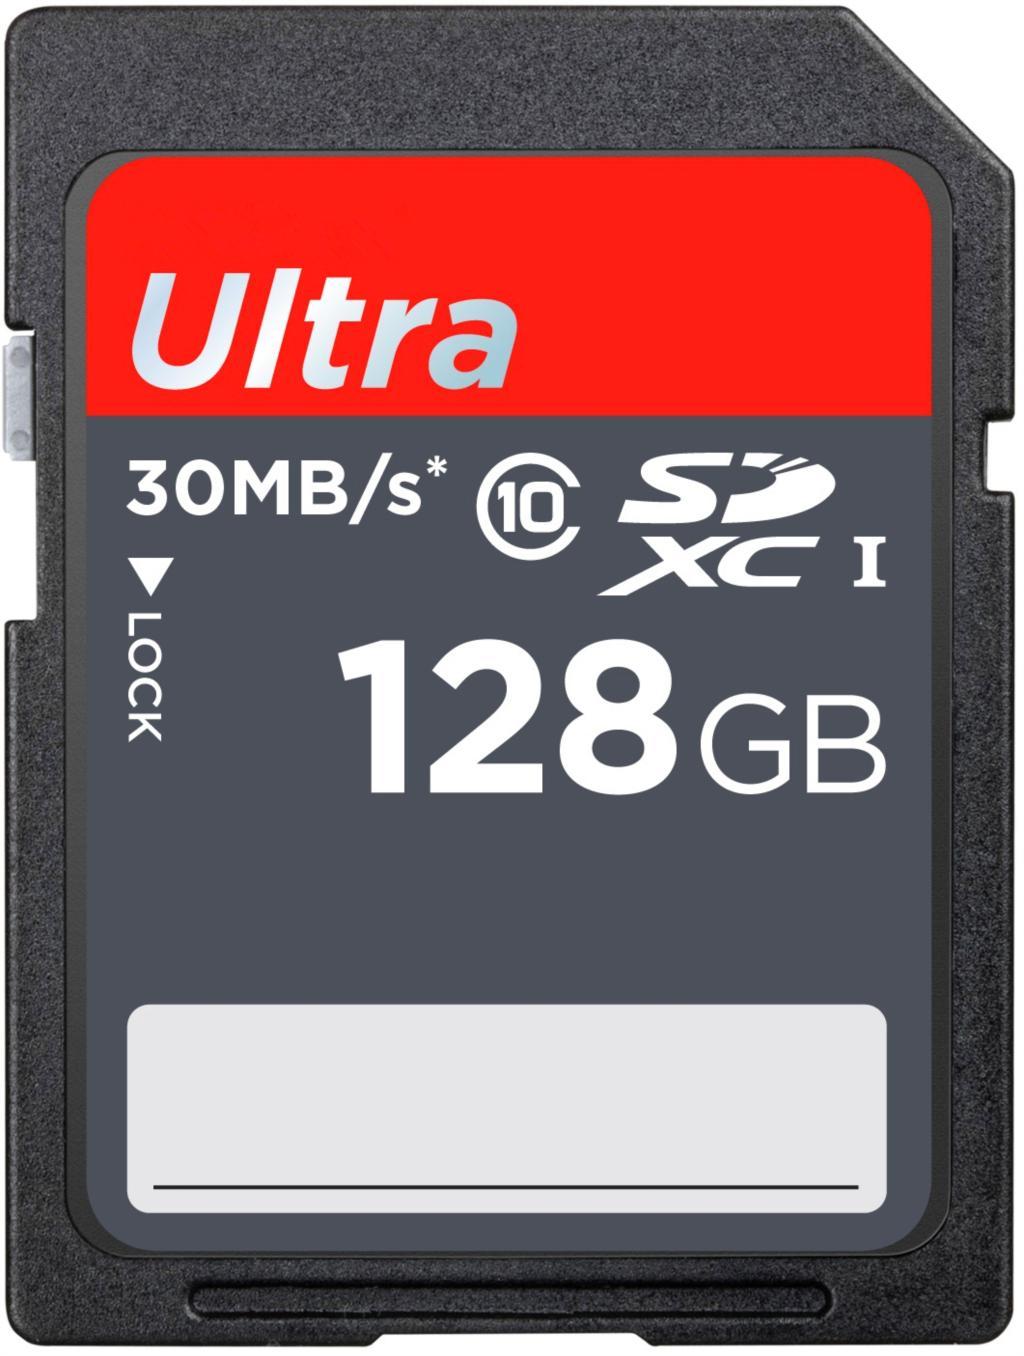 Memory card 8GB 16GB 32GB 64GB 128GB Ultra SDHC 30MB/s Class 10 sd card Expand pendrive camera storage Retail Package HK119-123(China (Mainland))